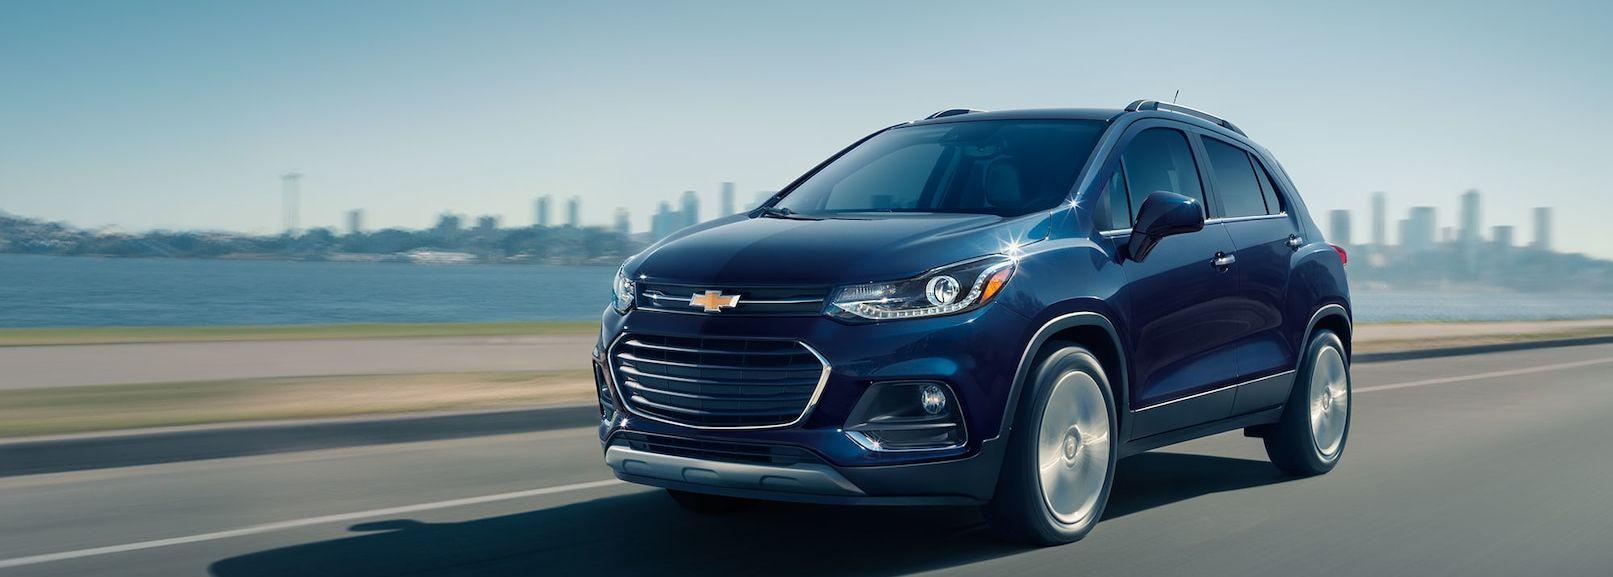 2019 Chevrolet Trax for Sale near Tulsa, OK - James Hodge